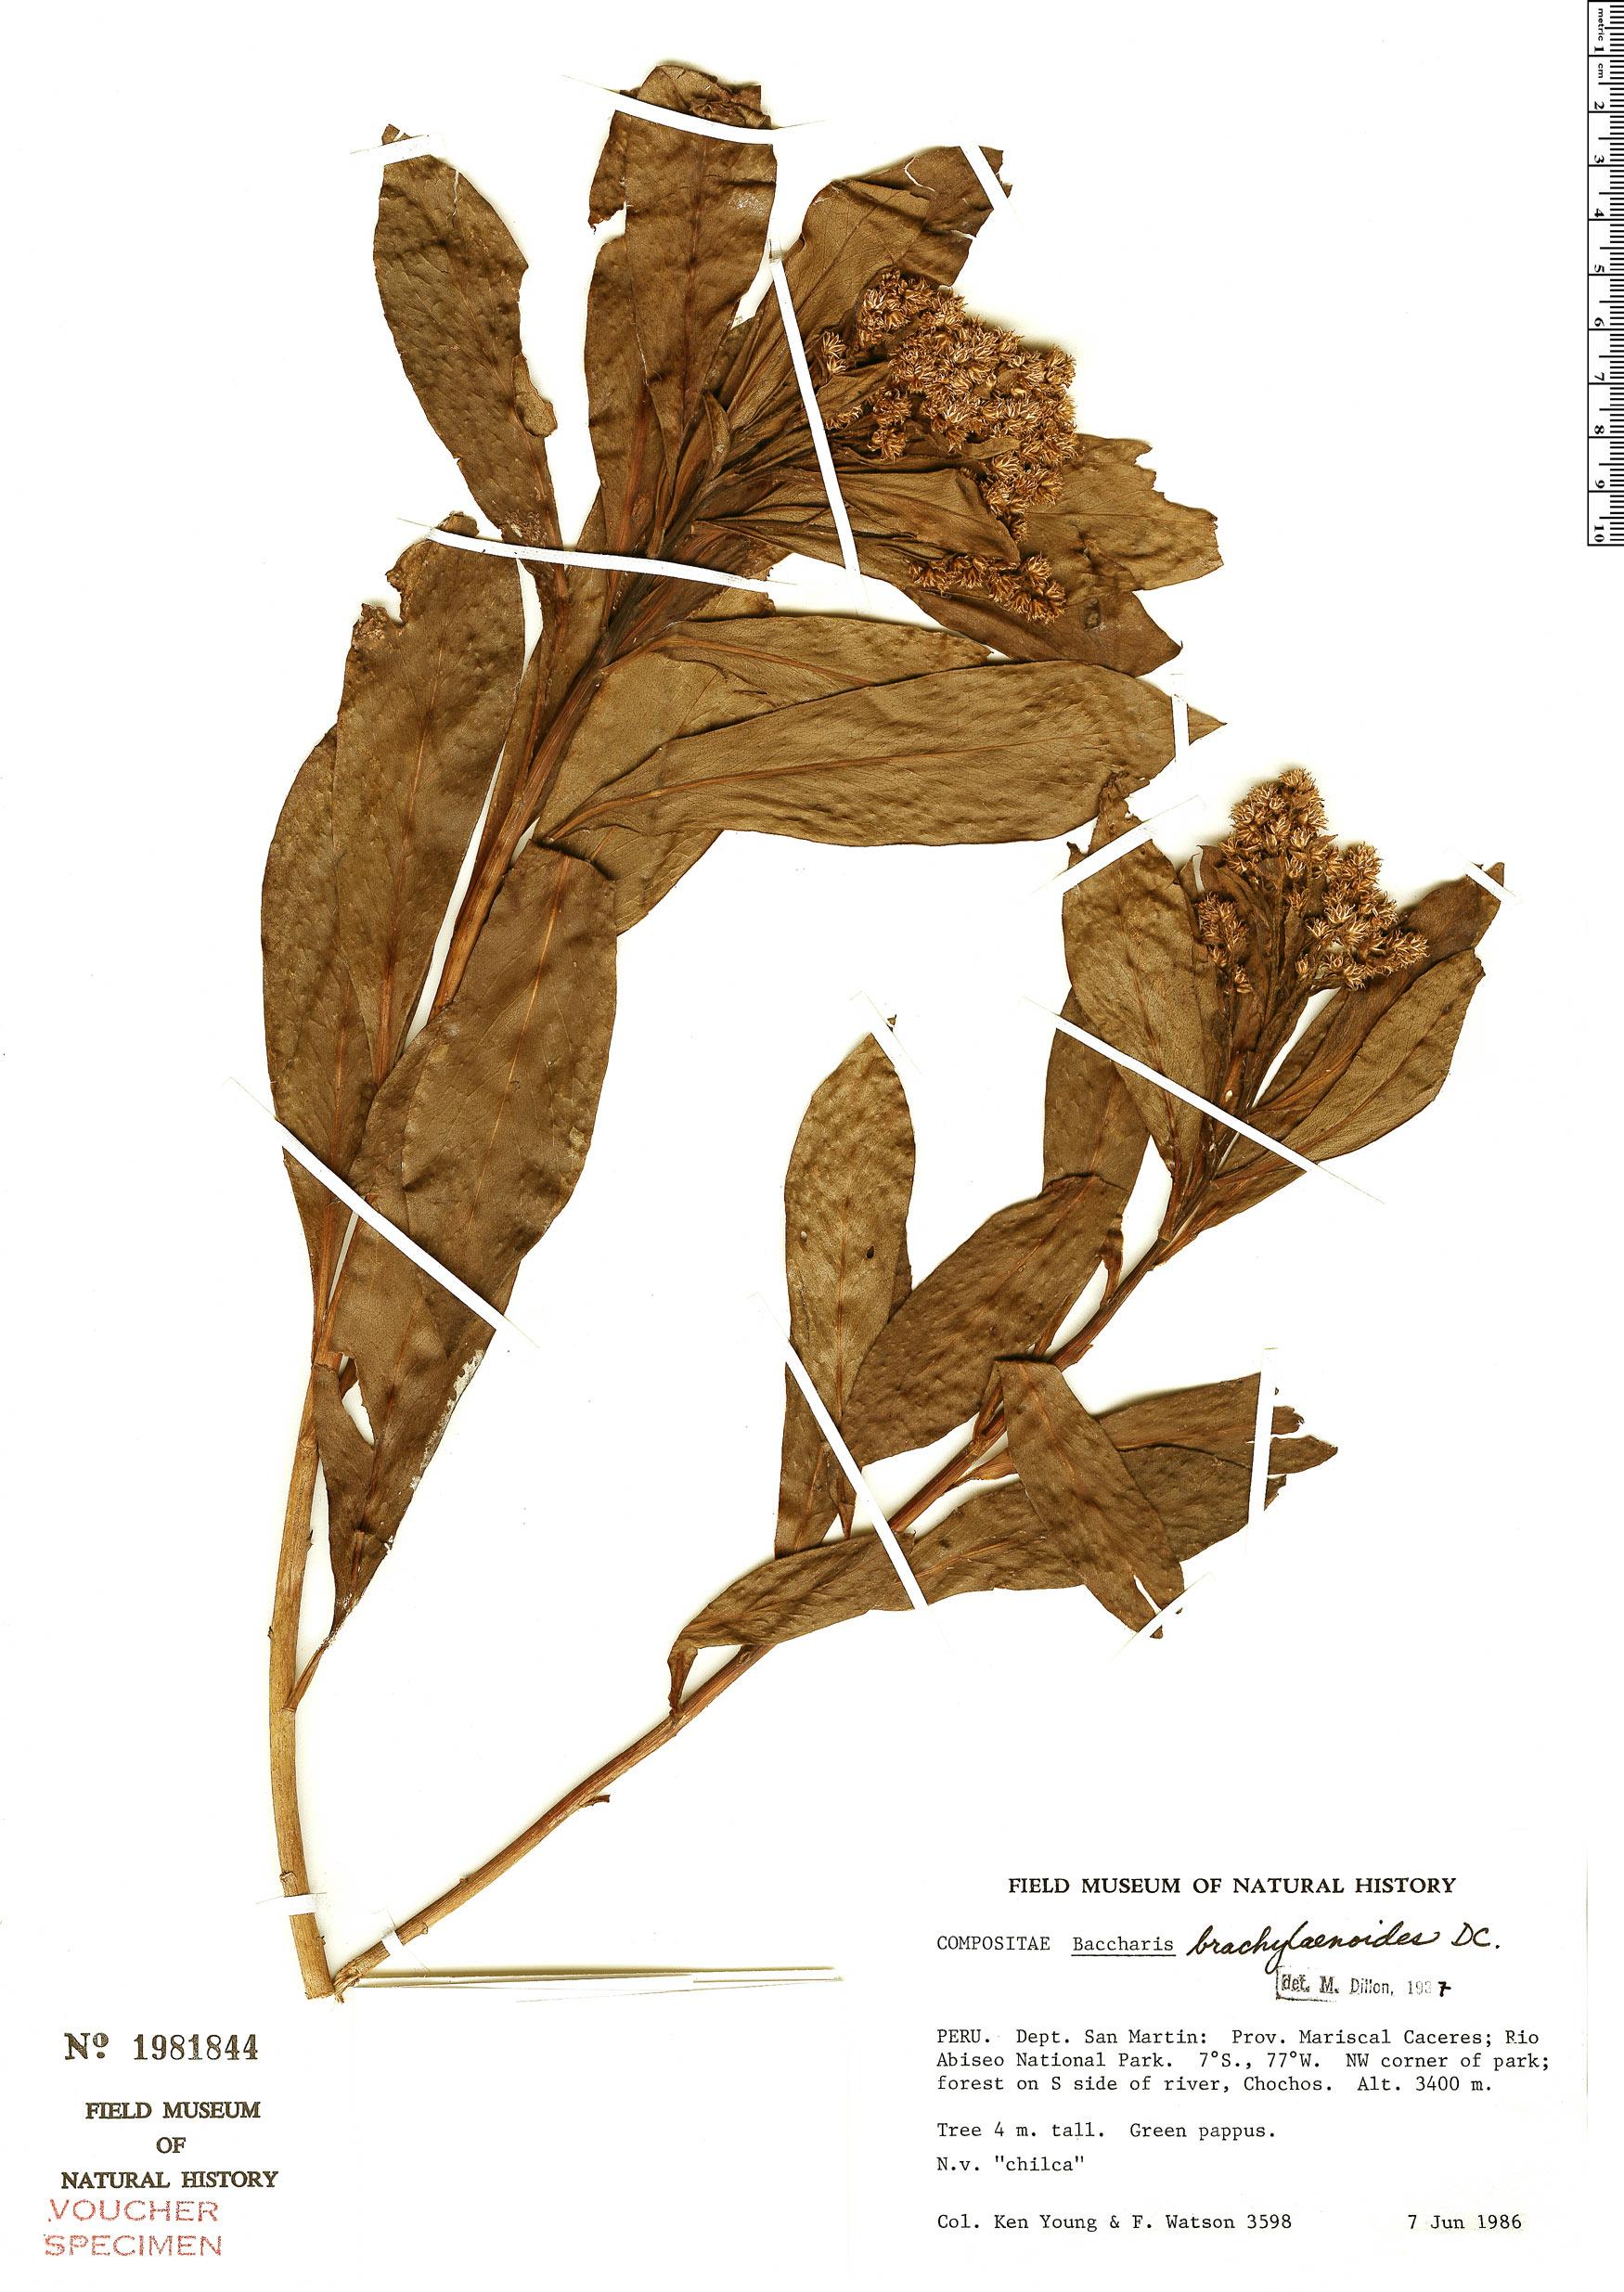 Specimen: Baccharis brachylaenoides